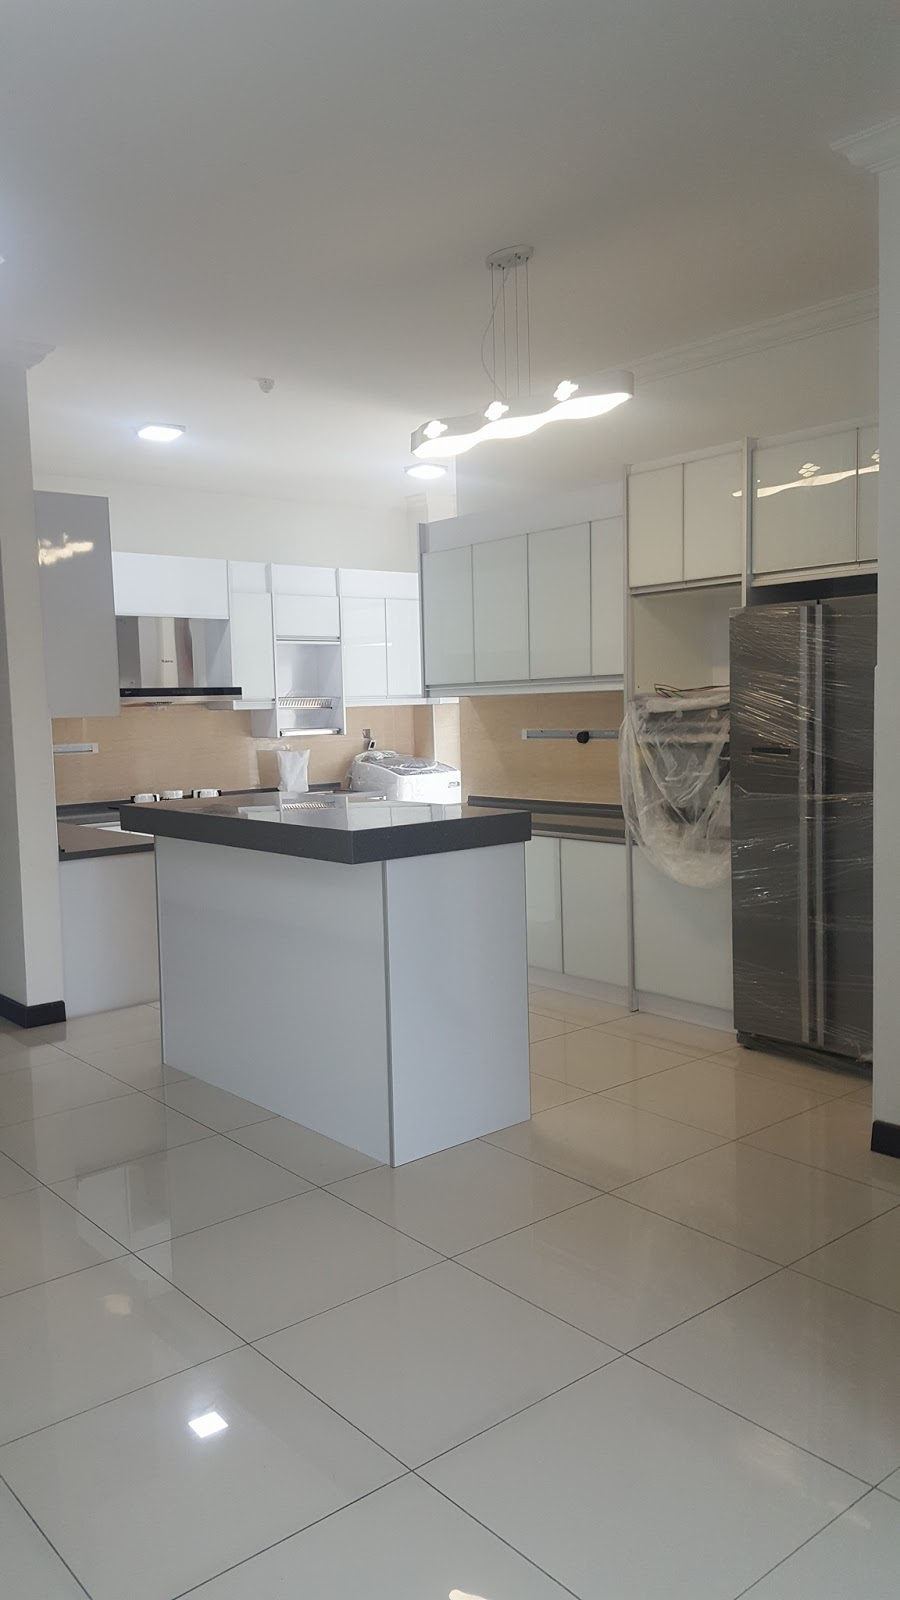 Kitchen Cabinet Tersebut Kami Menggunakan Material 3g Putih Untuk Bahagian Pintu Manakala Table Top Pelanggan Telah Memilih Solid